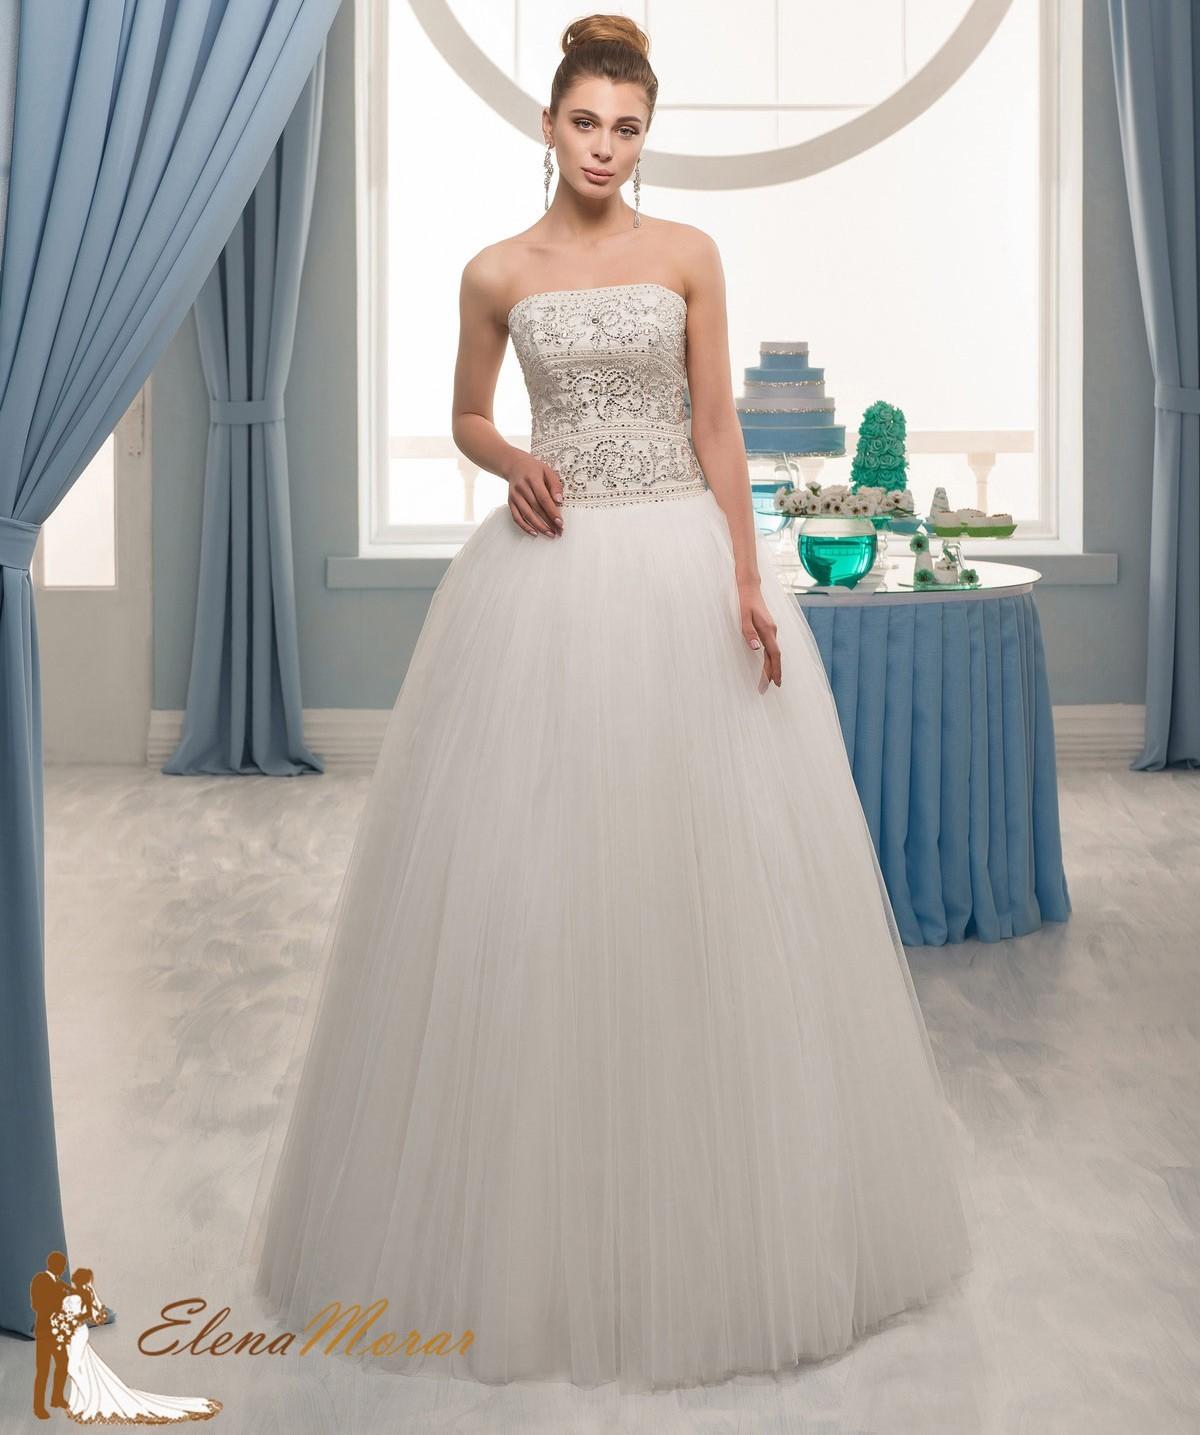 Robe mariage princesse en tulle avec bustier tincelant marya for Robes de mariage abordables